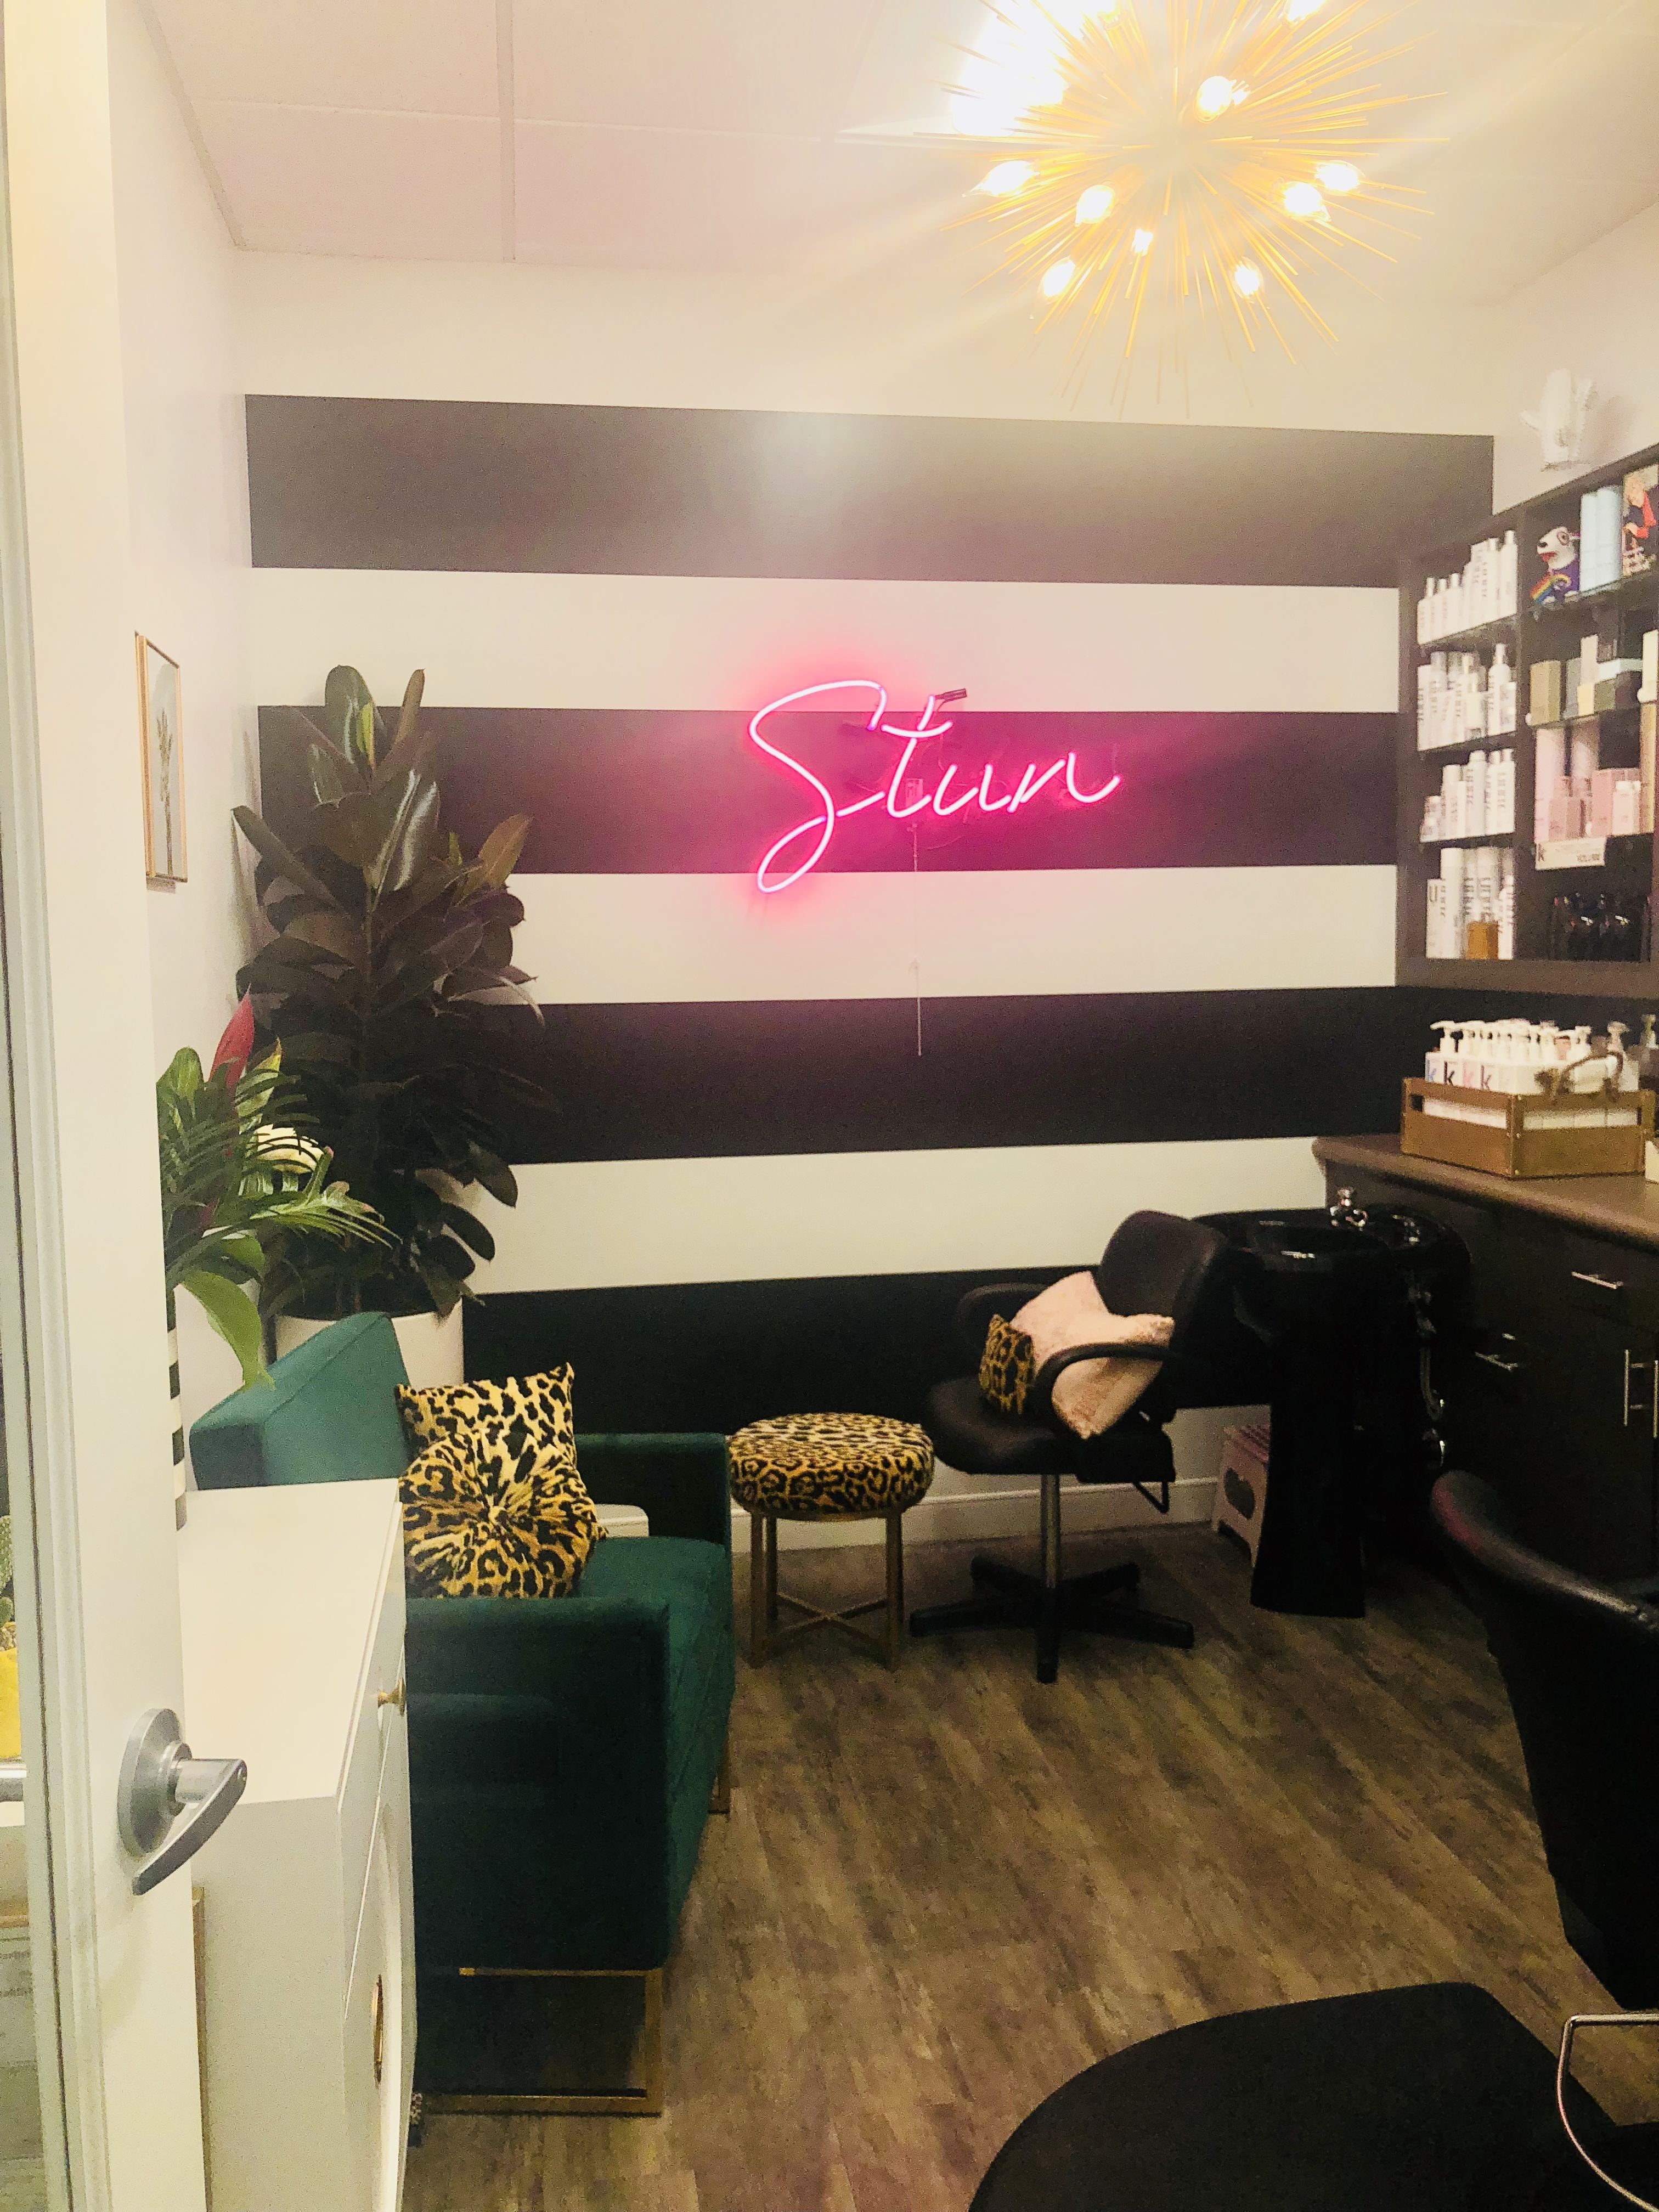 Stun Studio Salon Alamo, Ca Salon Suites Studio Salon black and